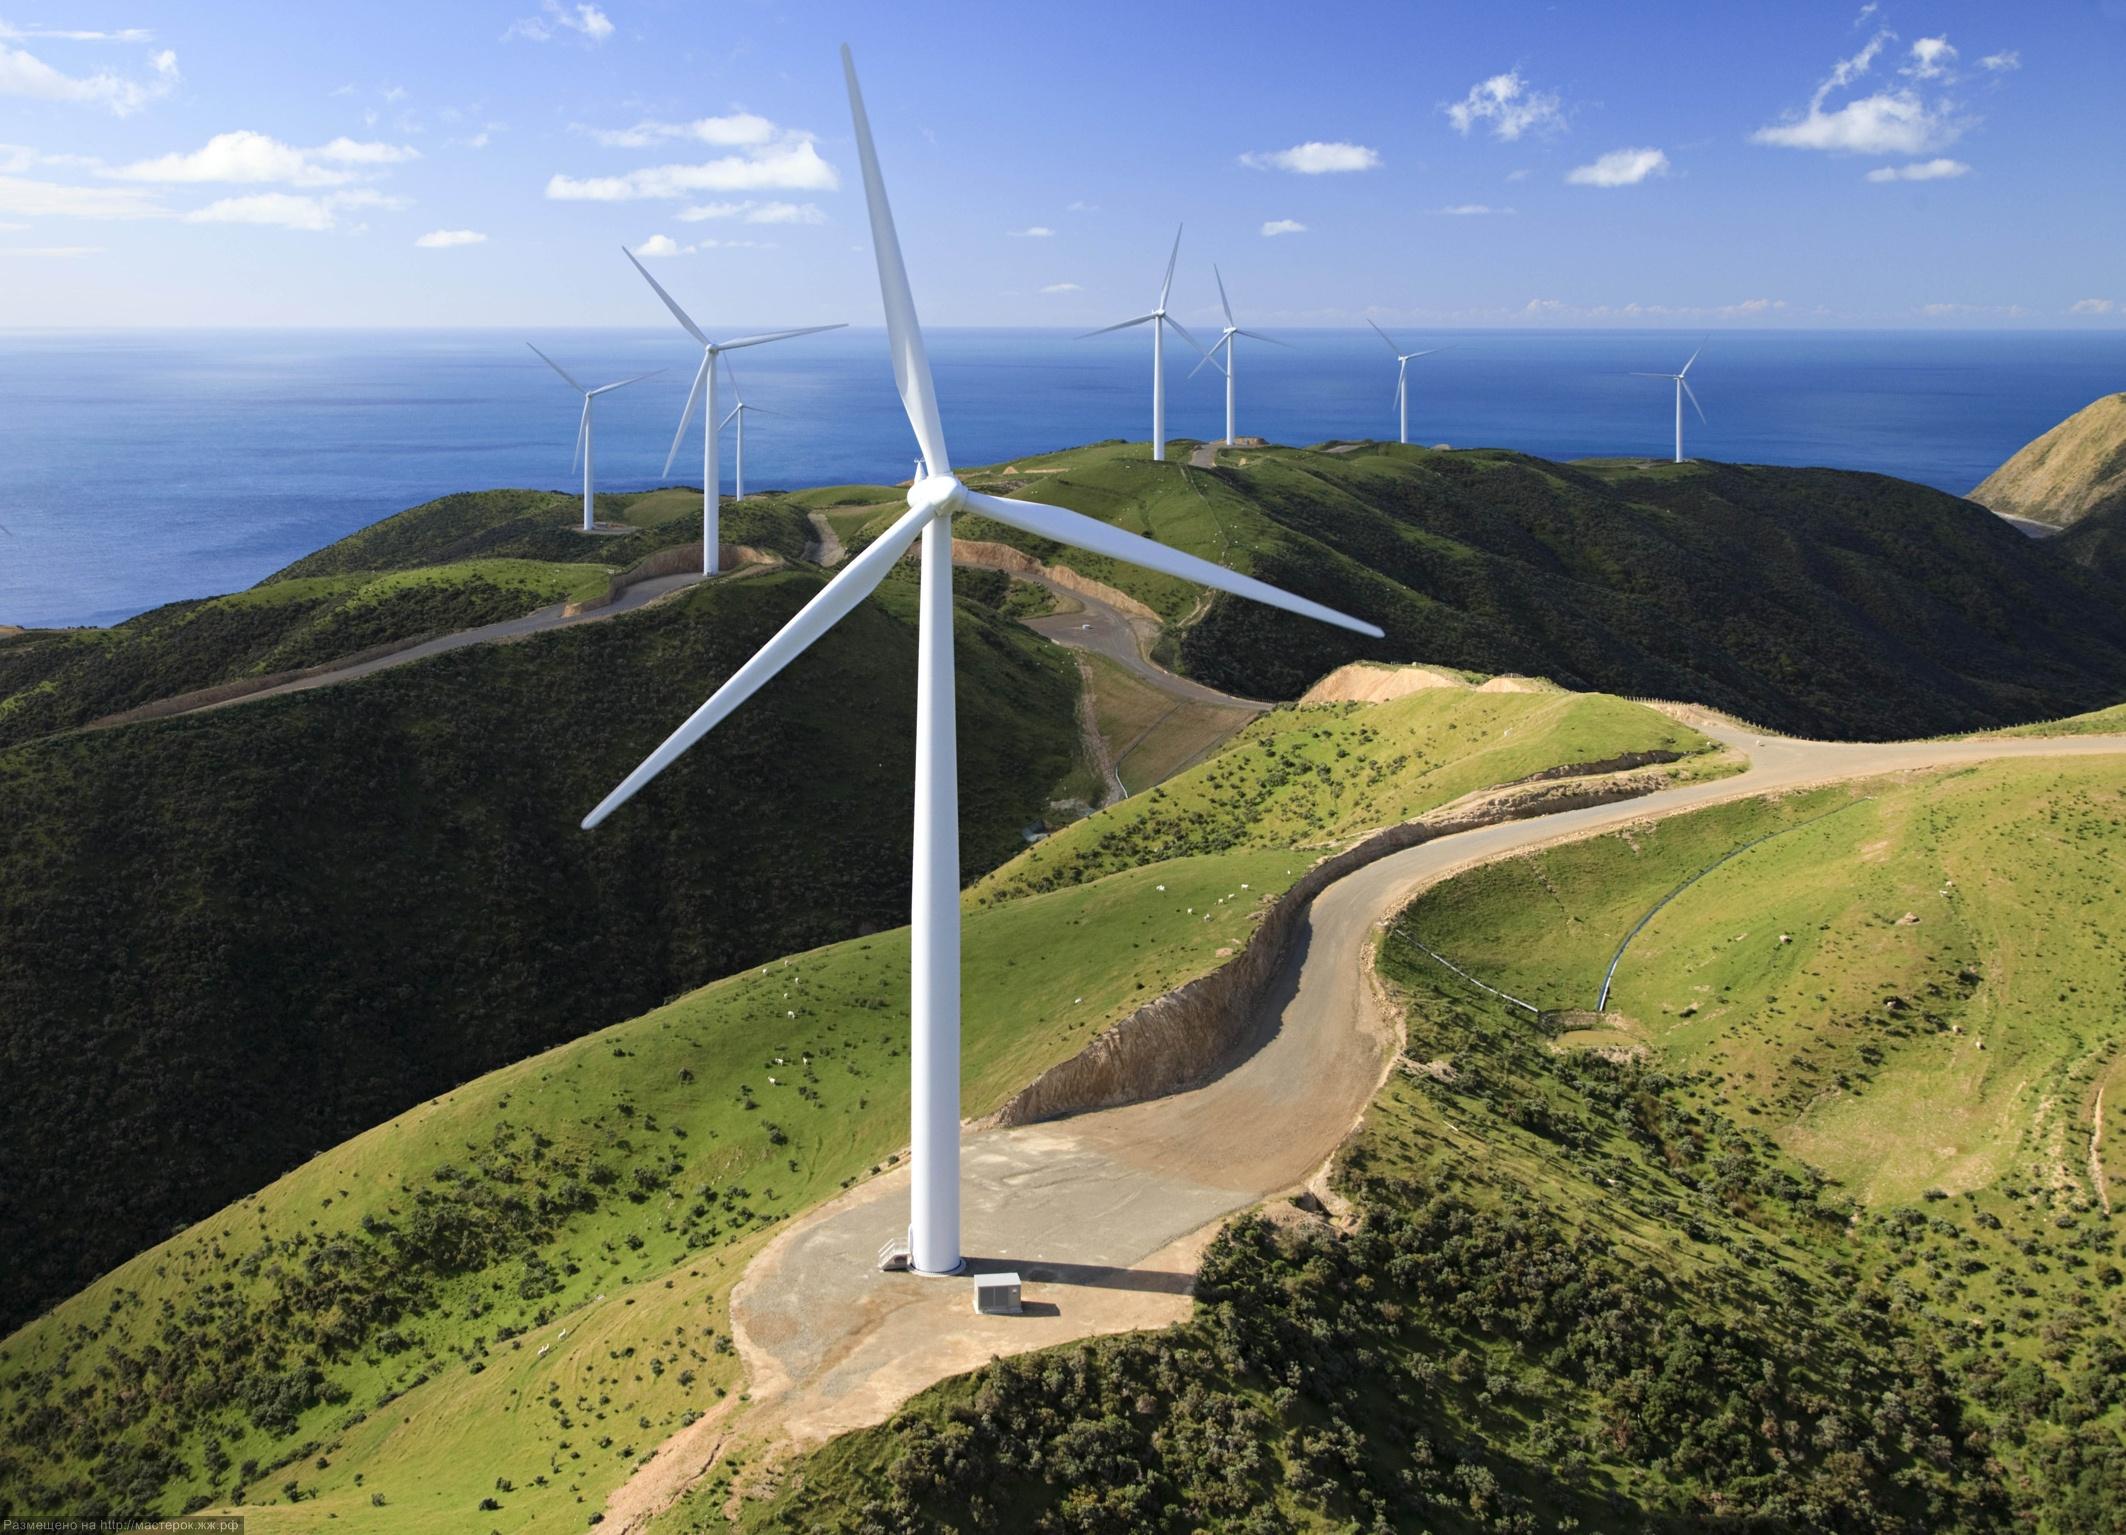 West Wind - Erster Windpark in Neuseeland / West Wind – First wind farm in New Zealand